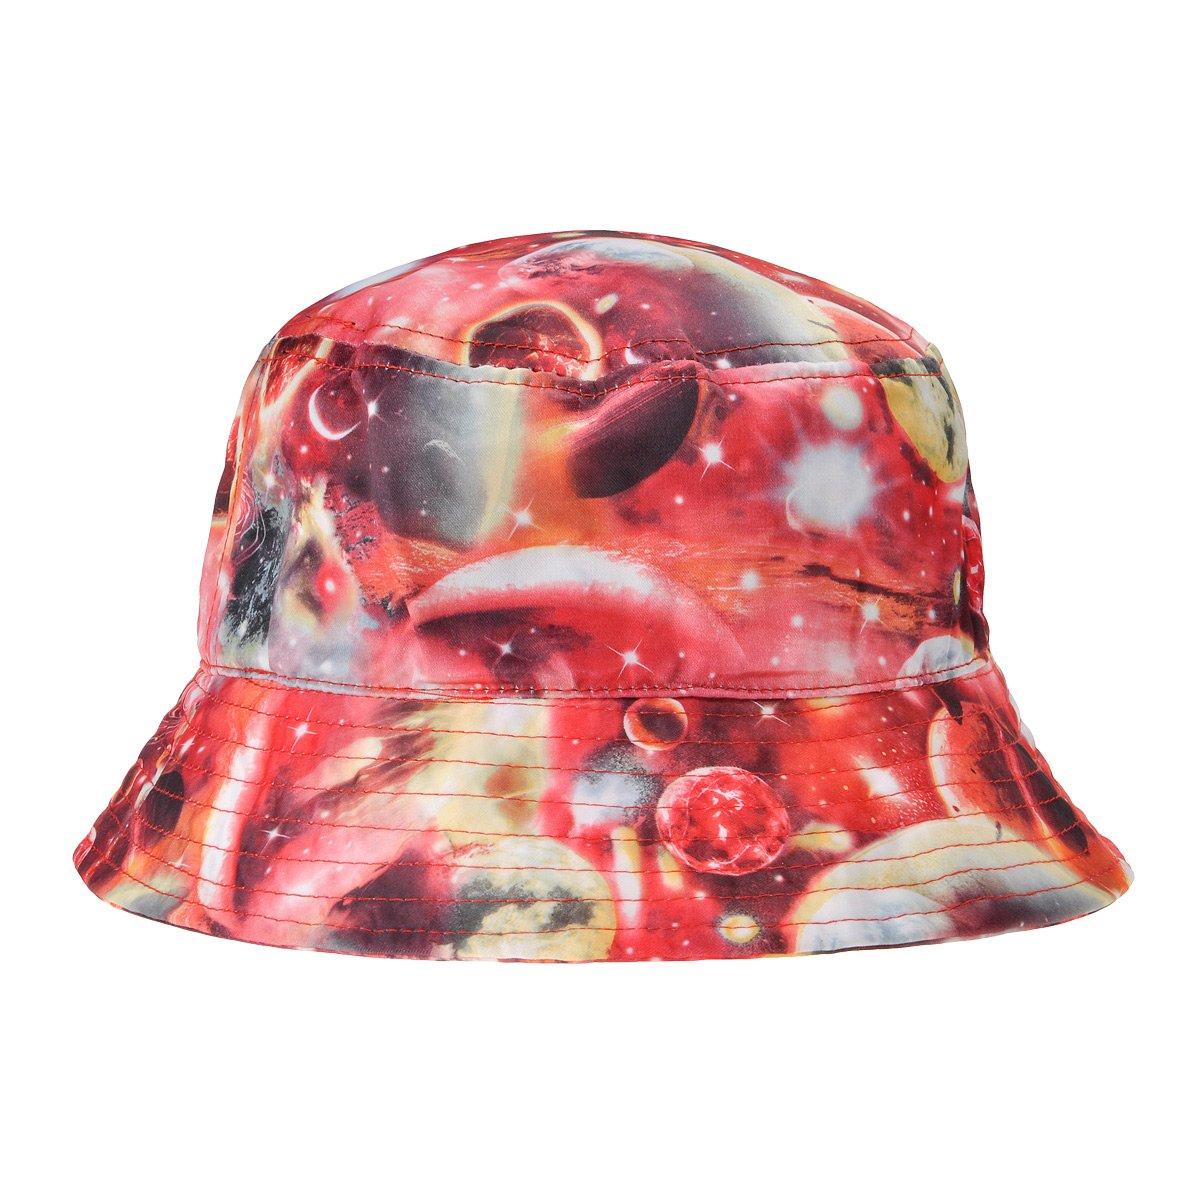 ZLYC Unisex Galaxy Bucket Hat Summer Fisherman Cap for Men Women, Black FBA-ZYJ-MZ-134-BK